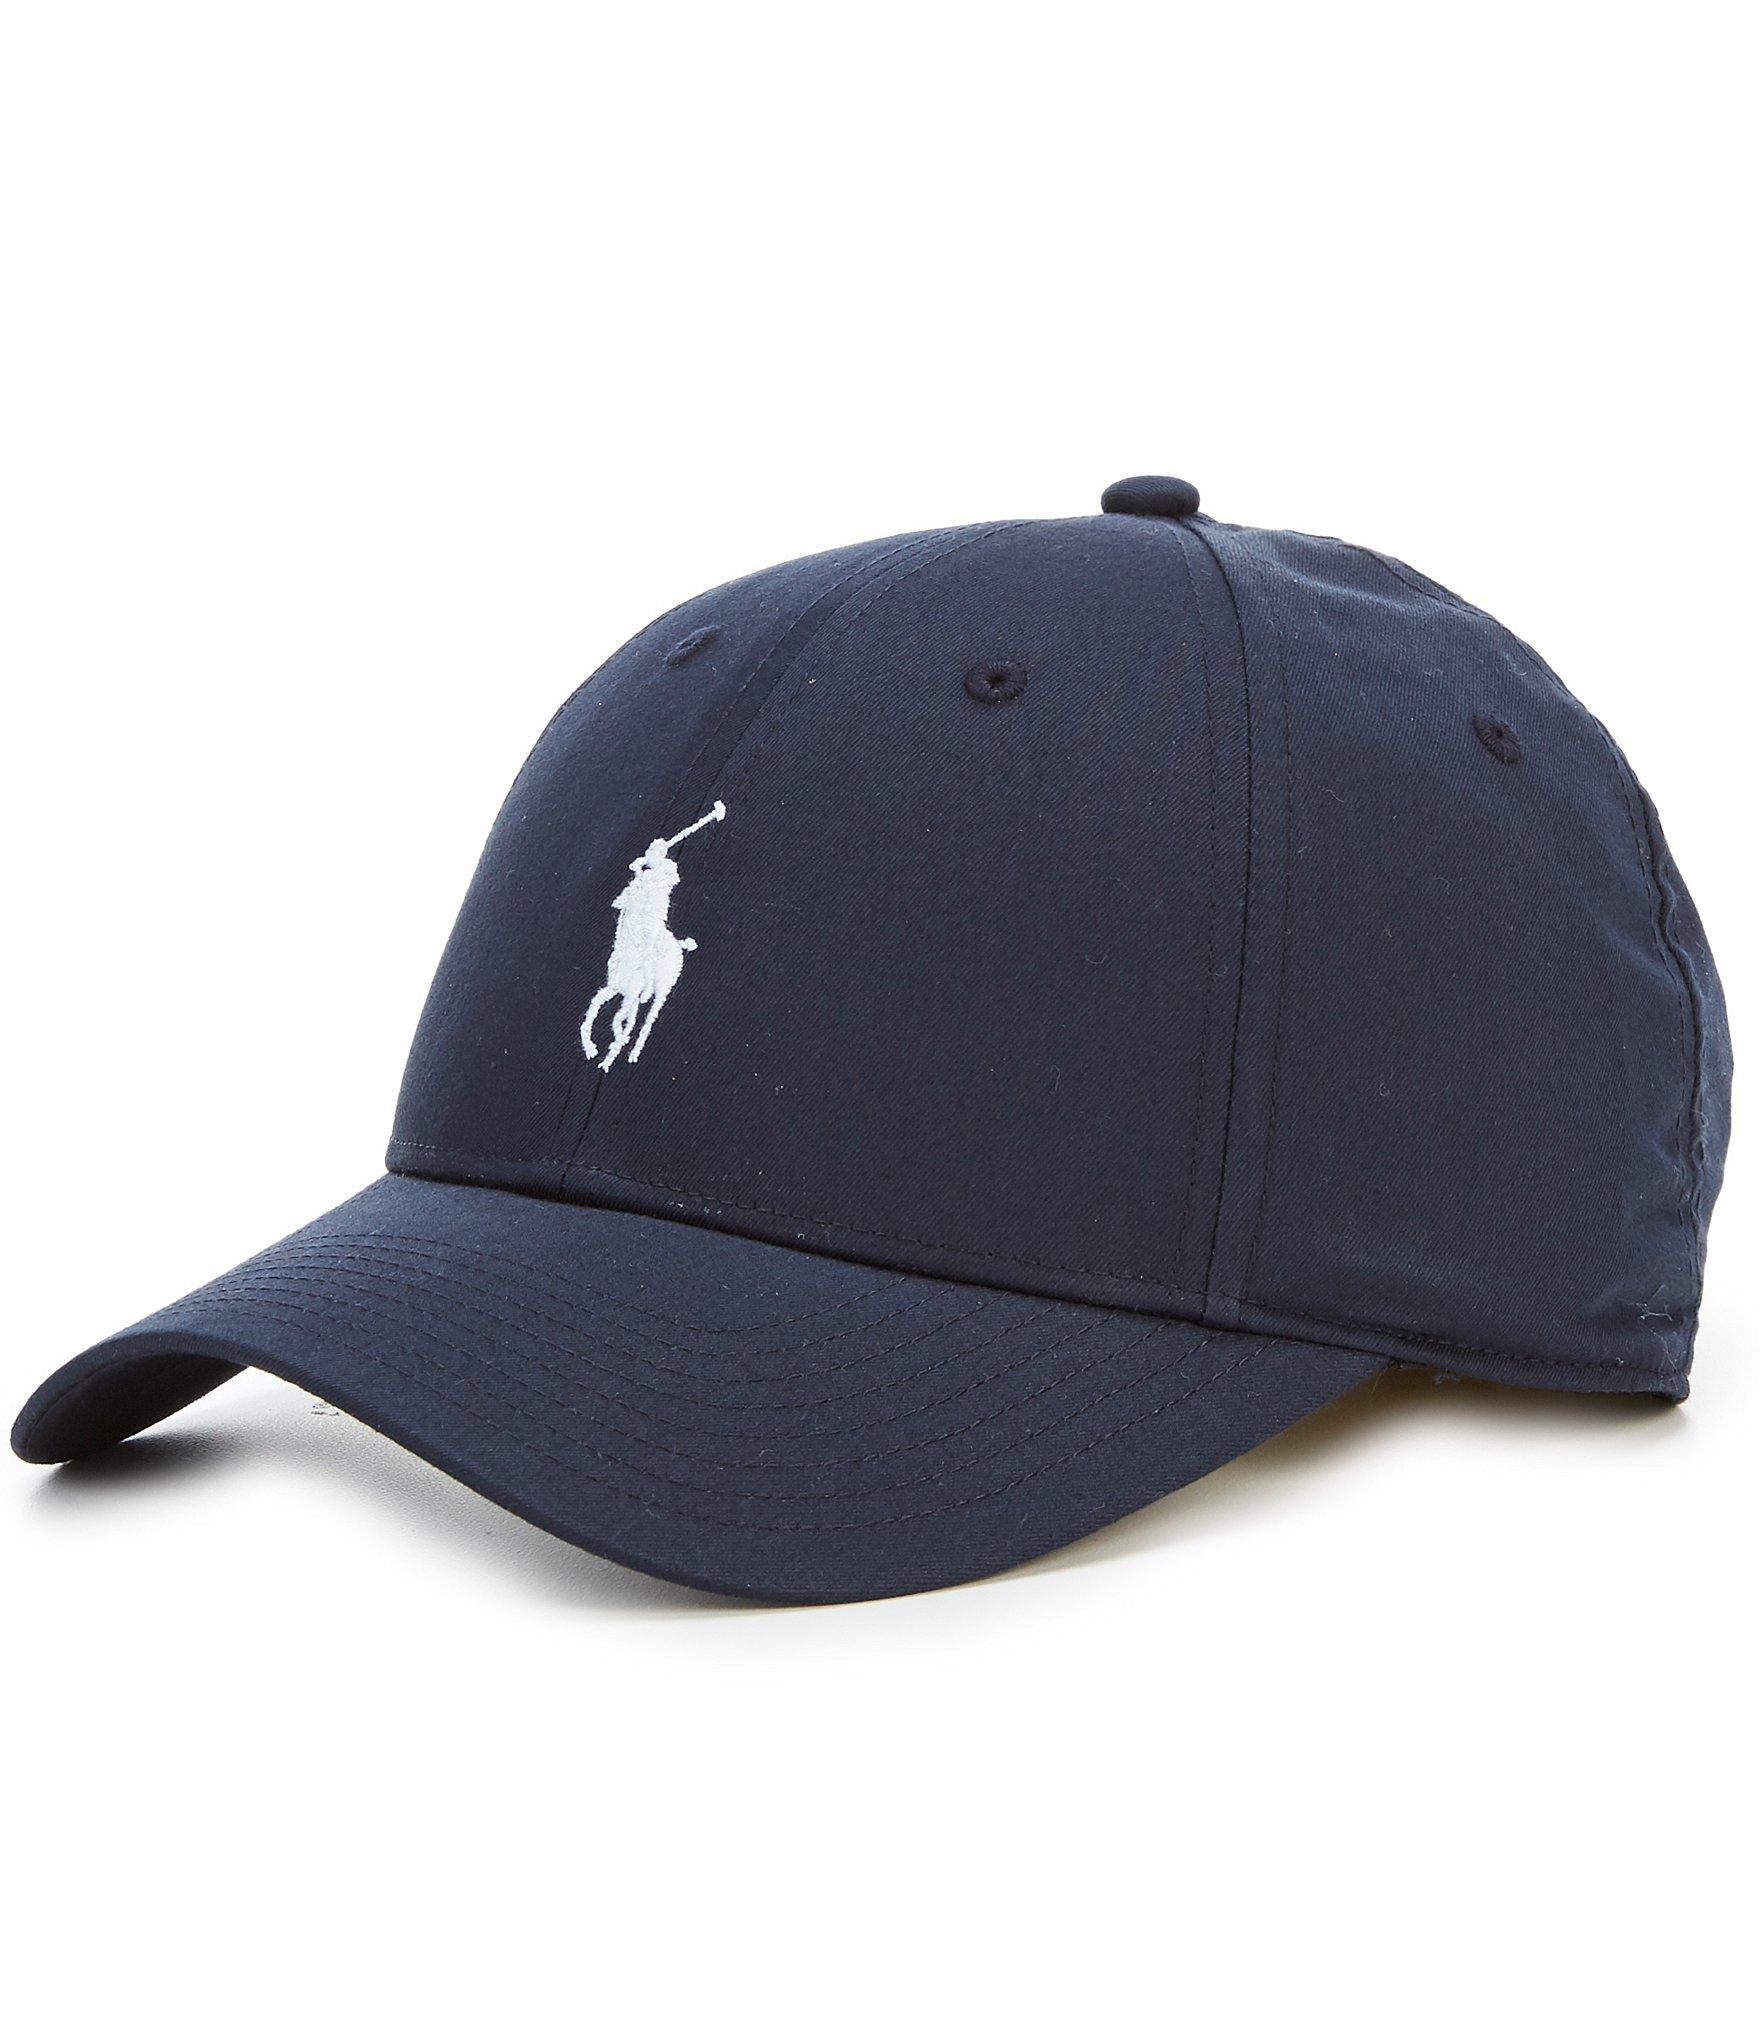 5e74a896 Polo Ralph Lauren Baseline Performance Cap in Blue for Men - Lyst